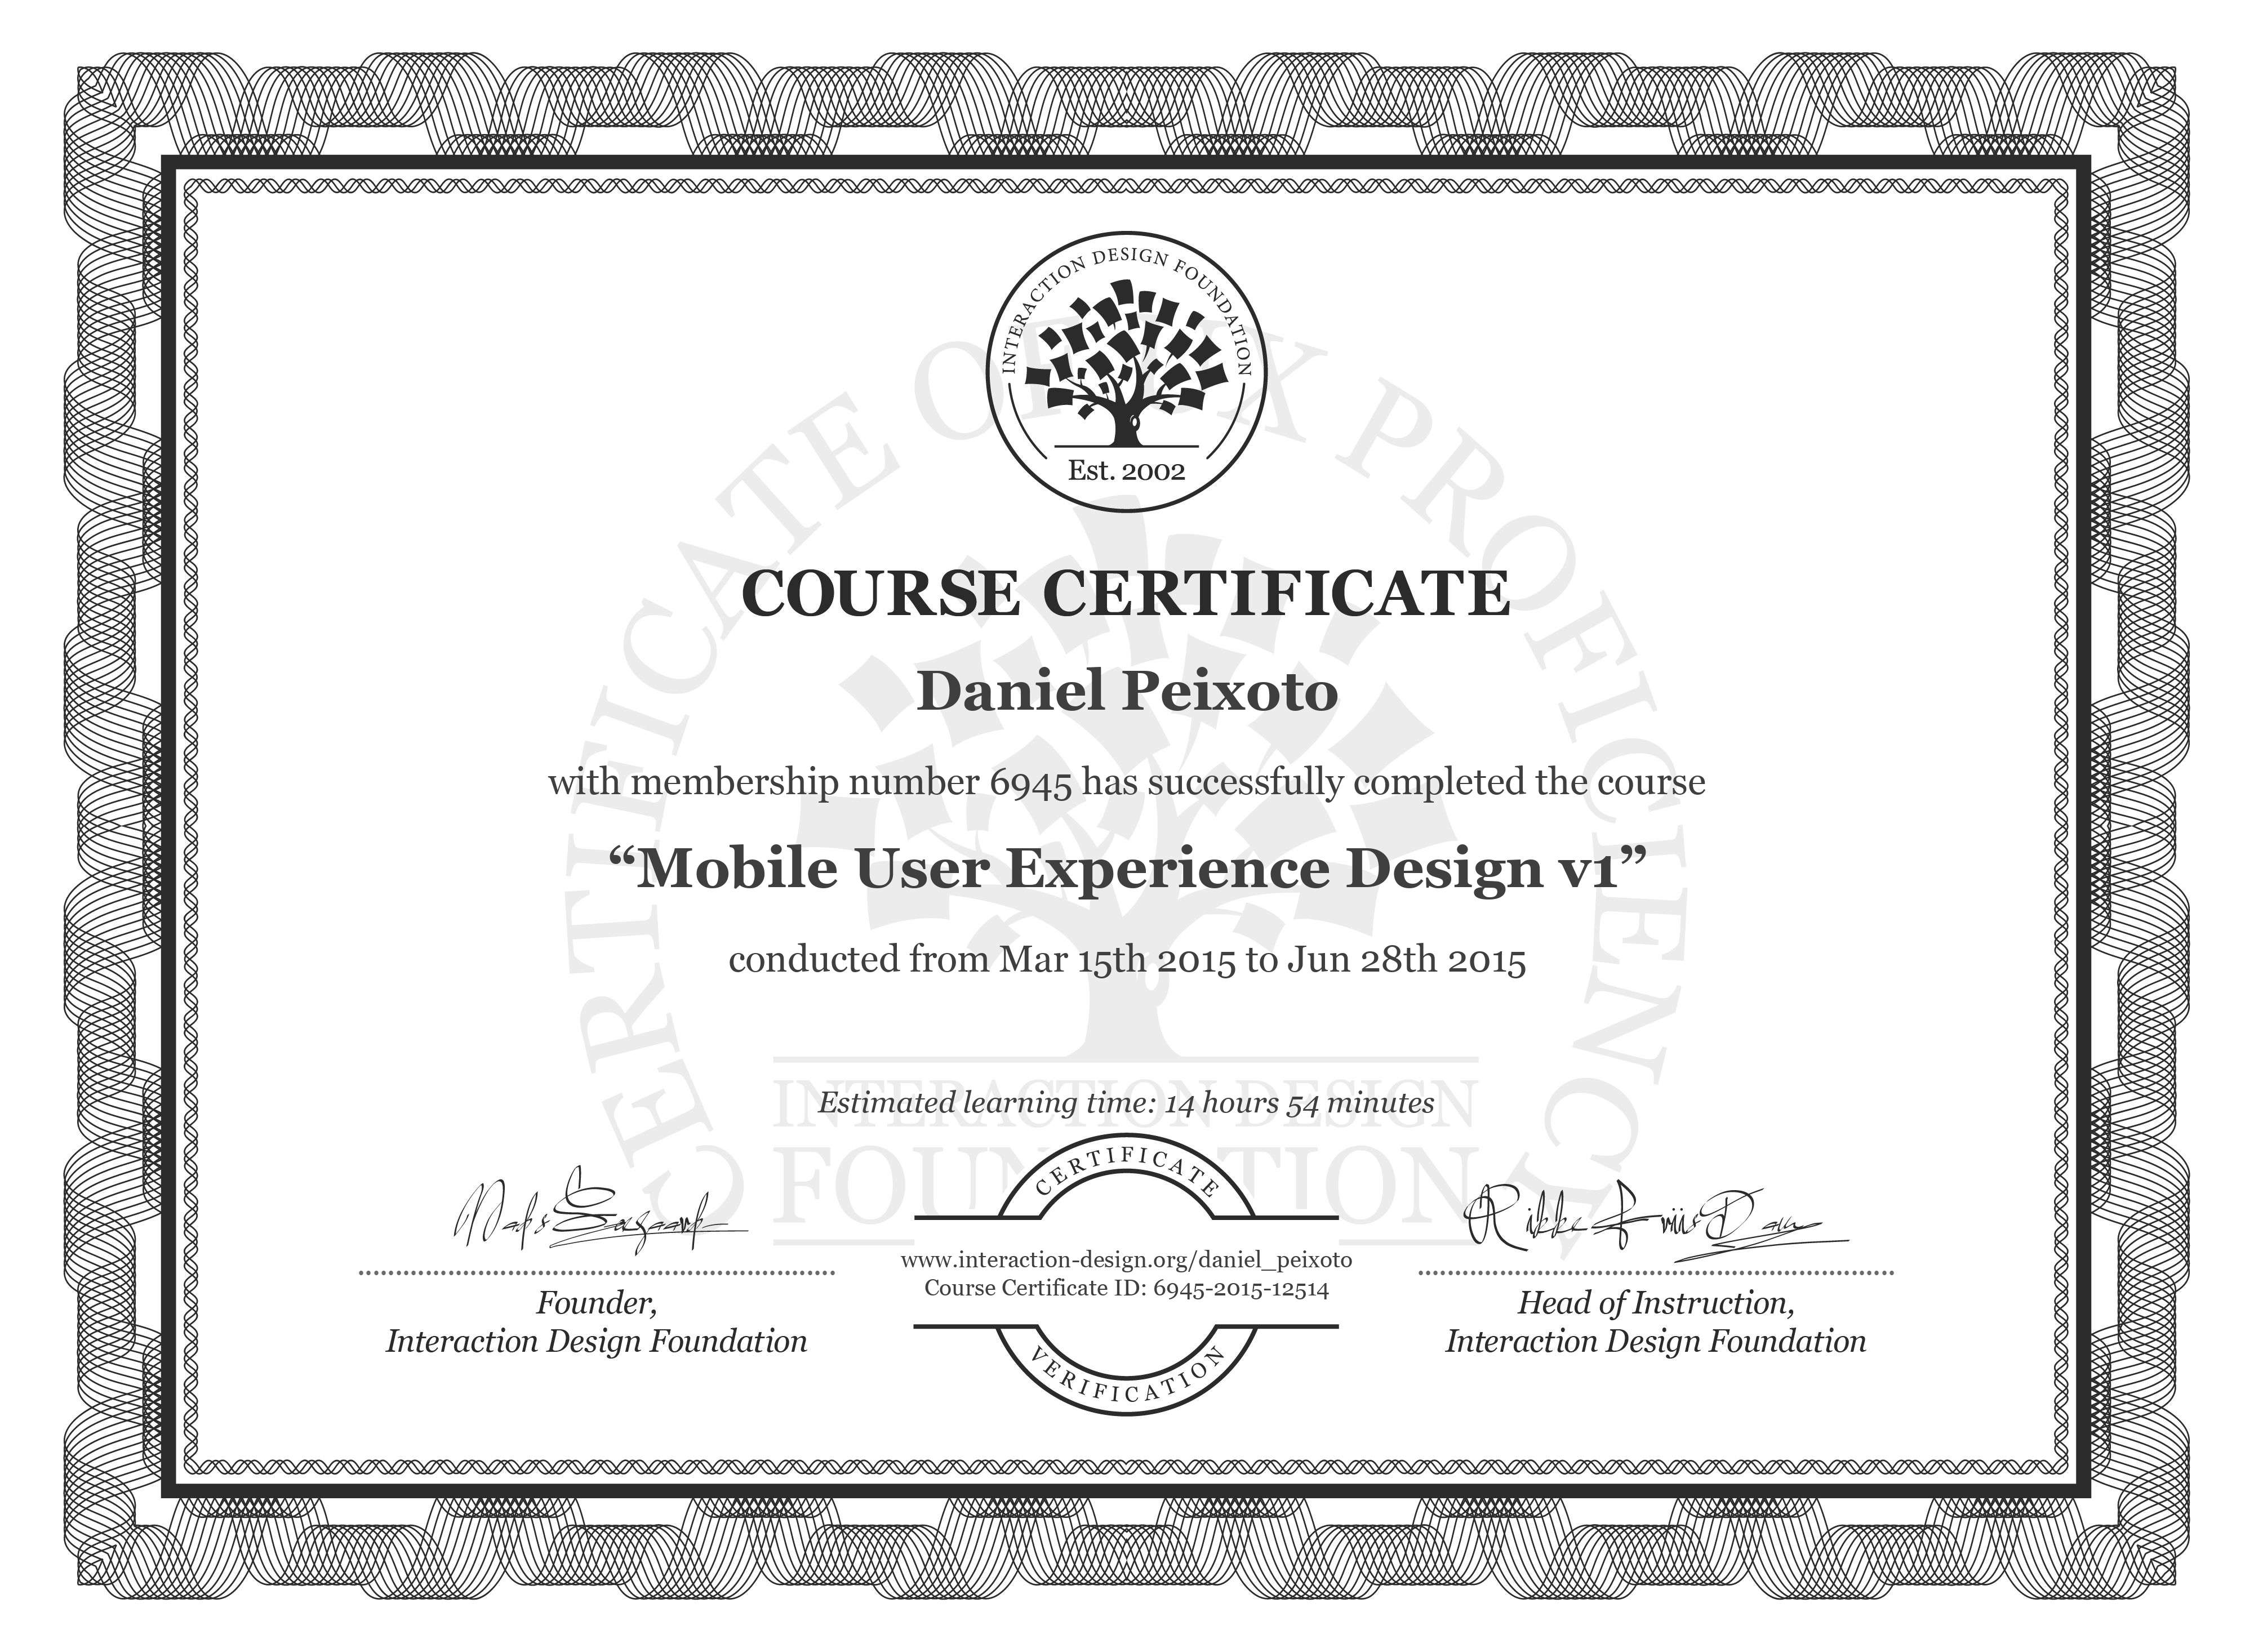 Daniel Peixoto's Course Certificate: Mobile User Experience Design